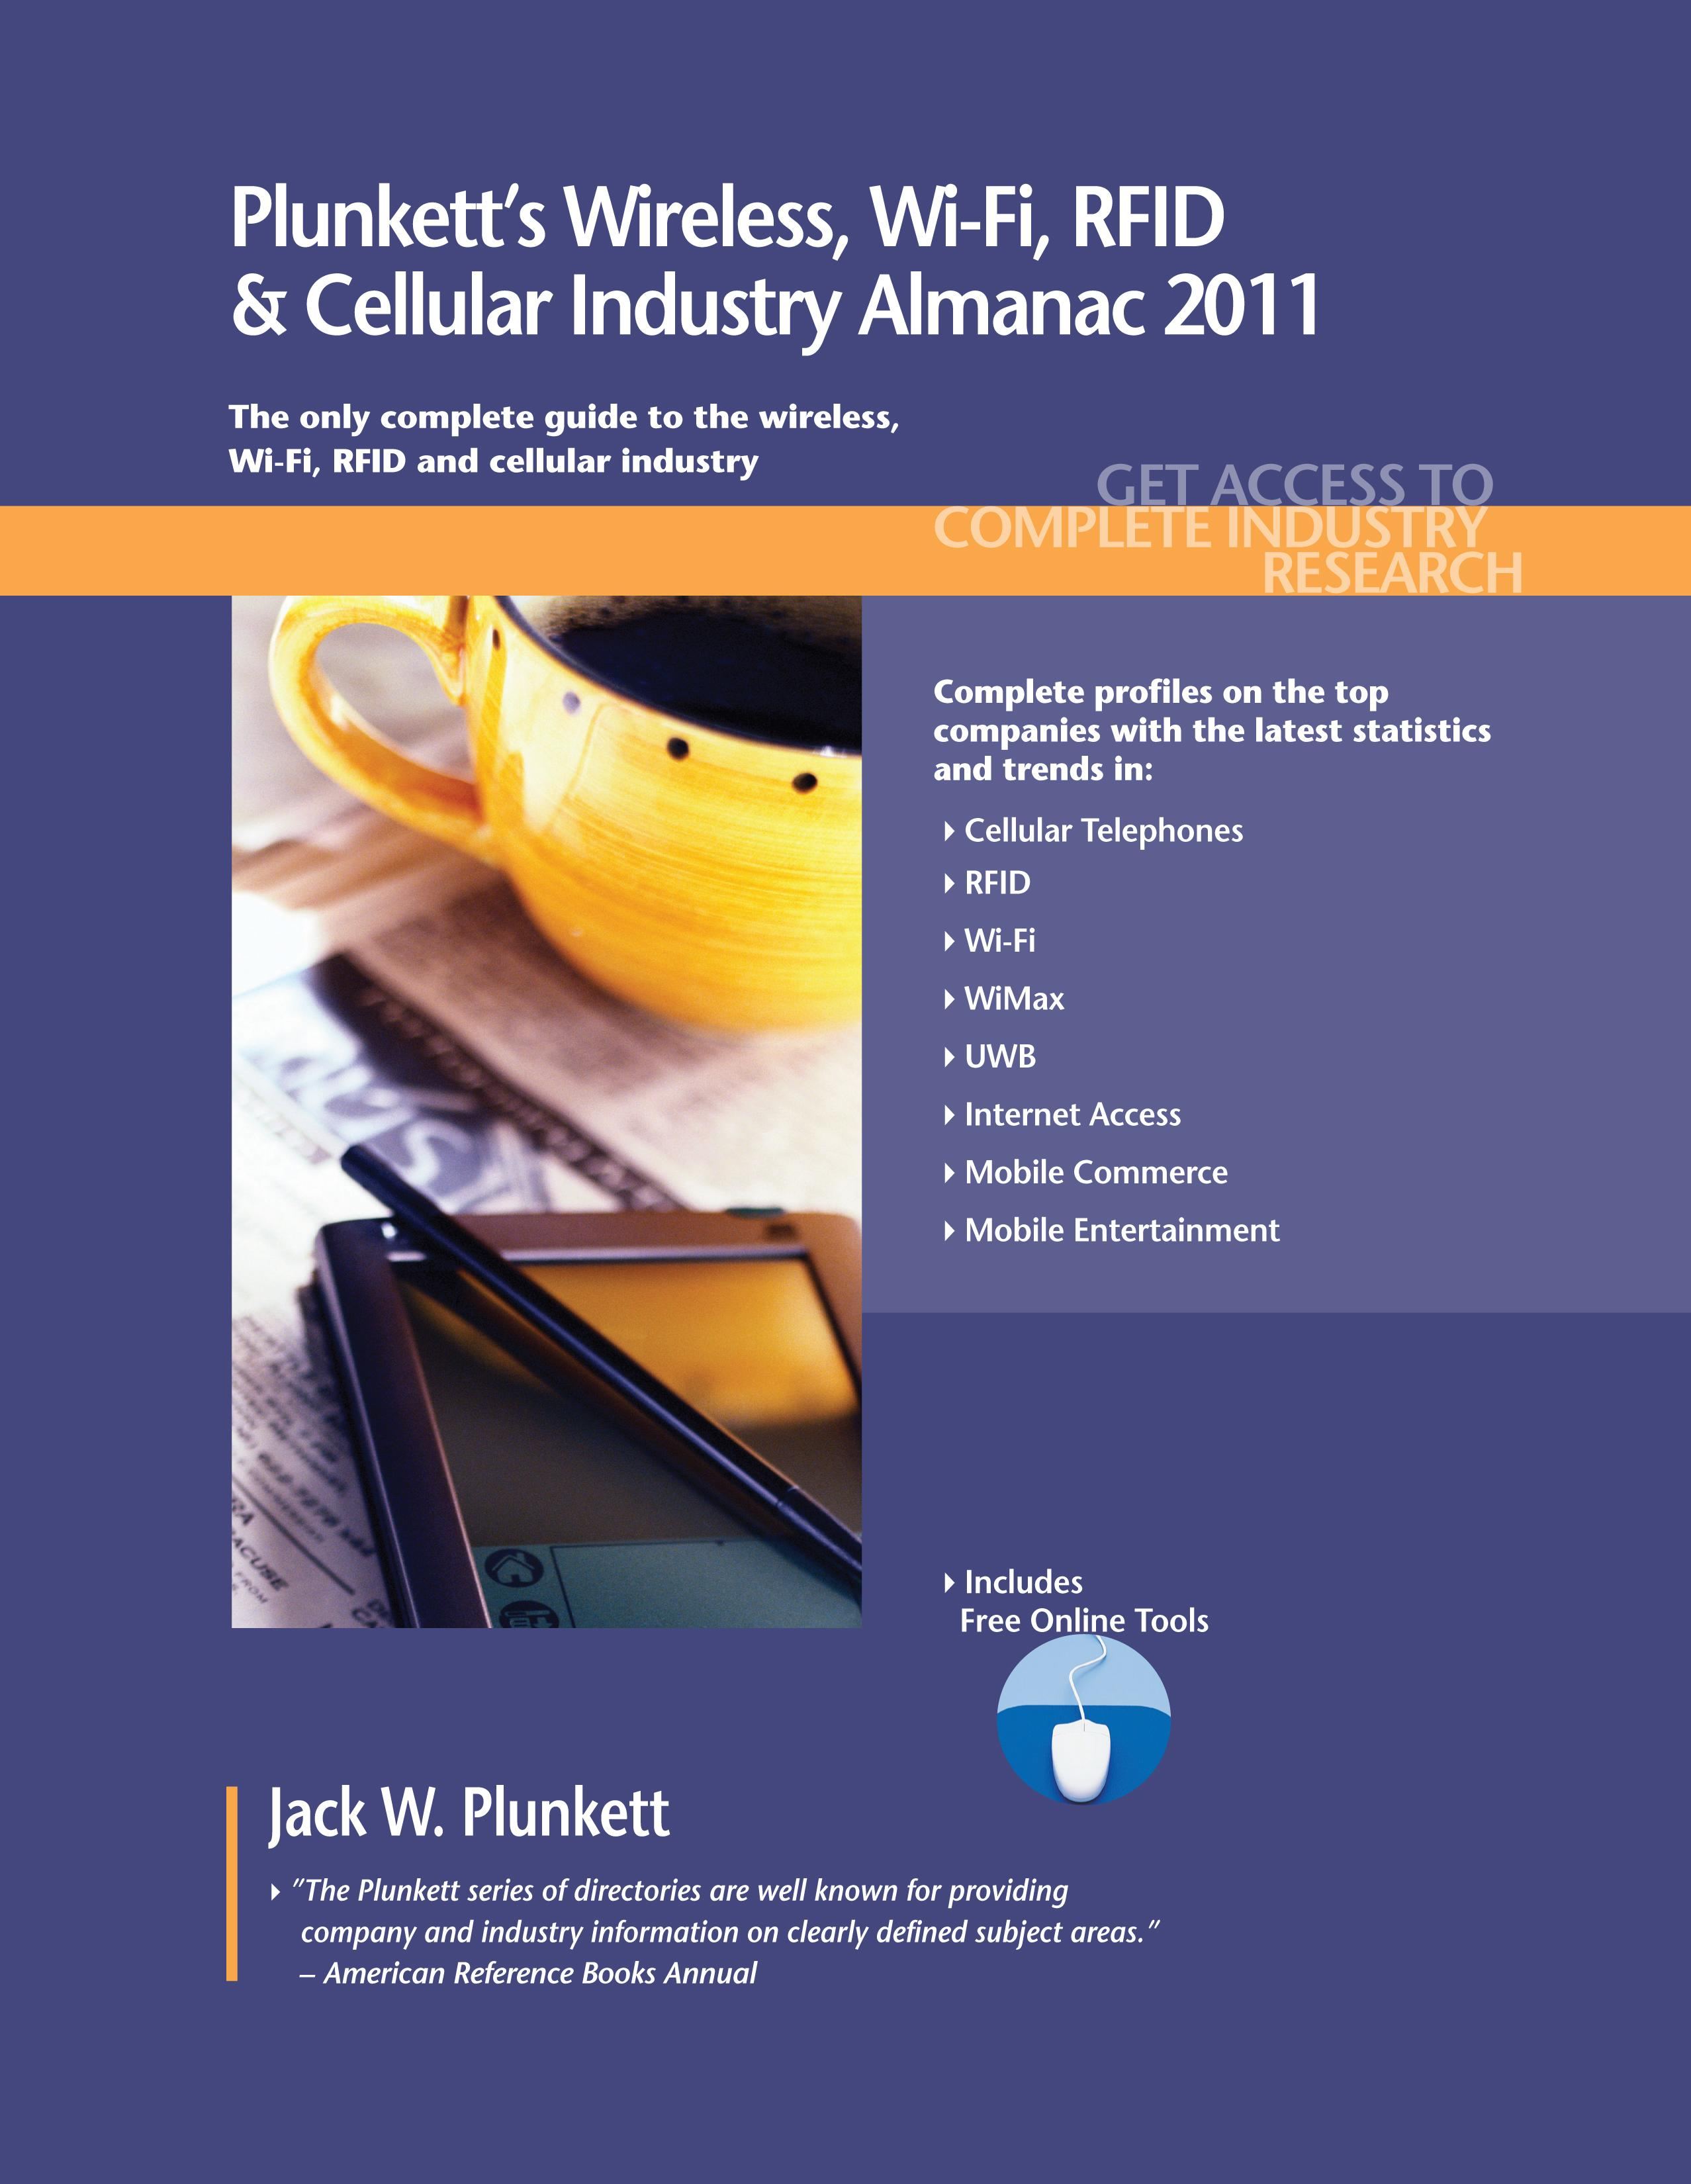 Plunkett's Wireless, Wi-Fi, Rfid & Cellular Industry Almanac 2011 EB9781593925185